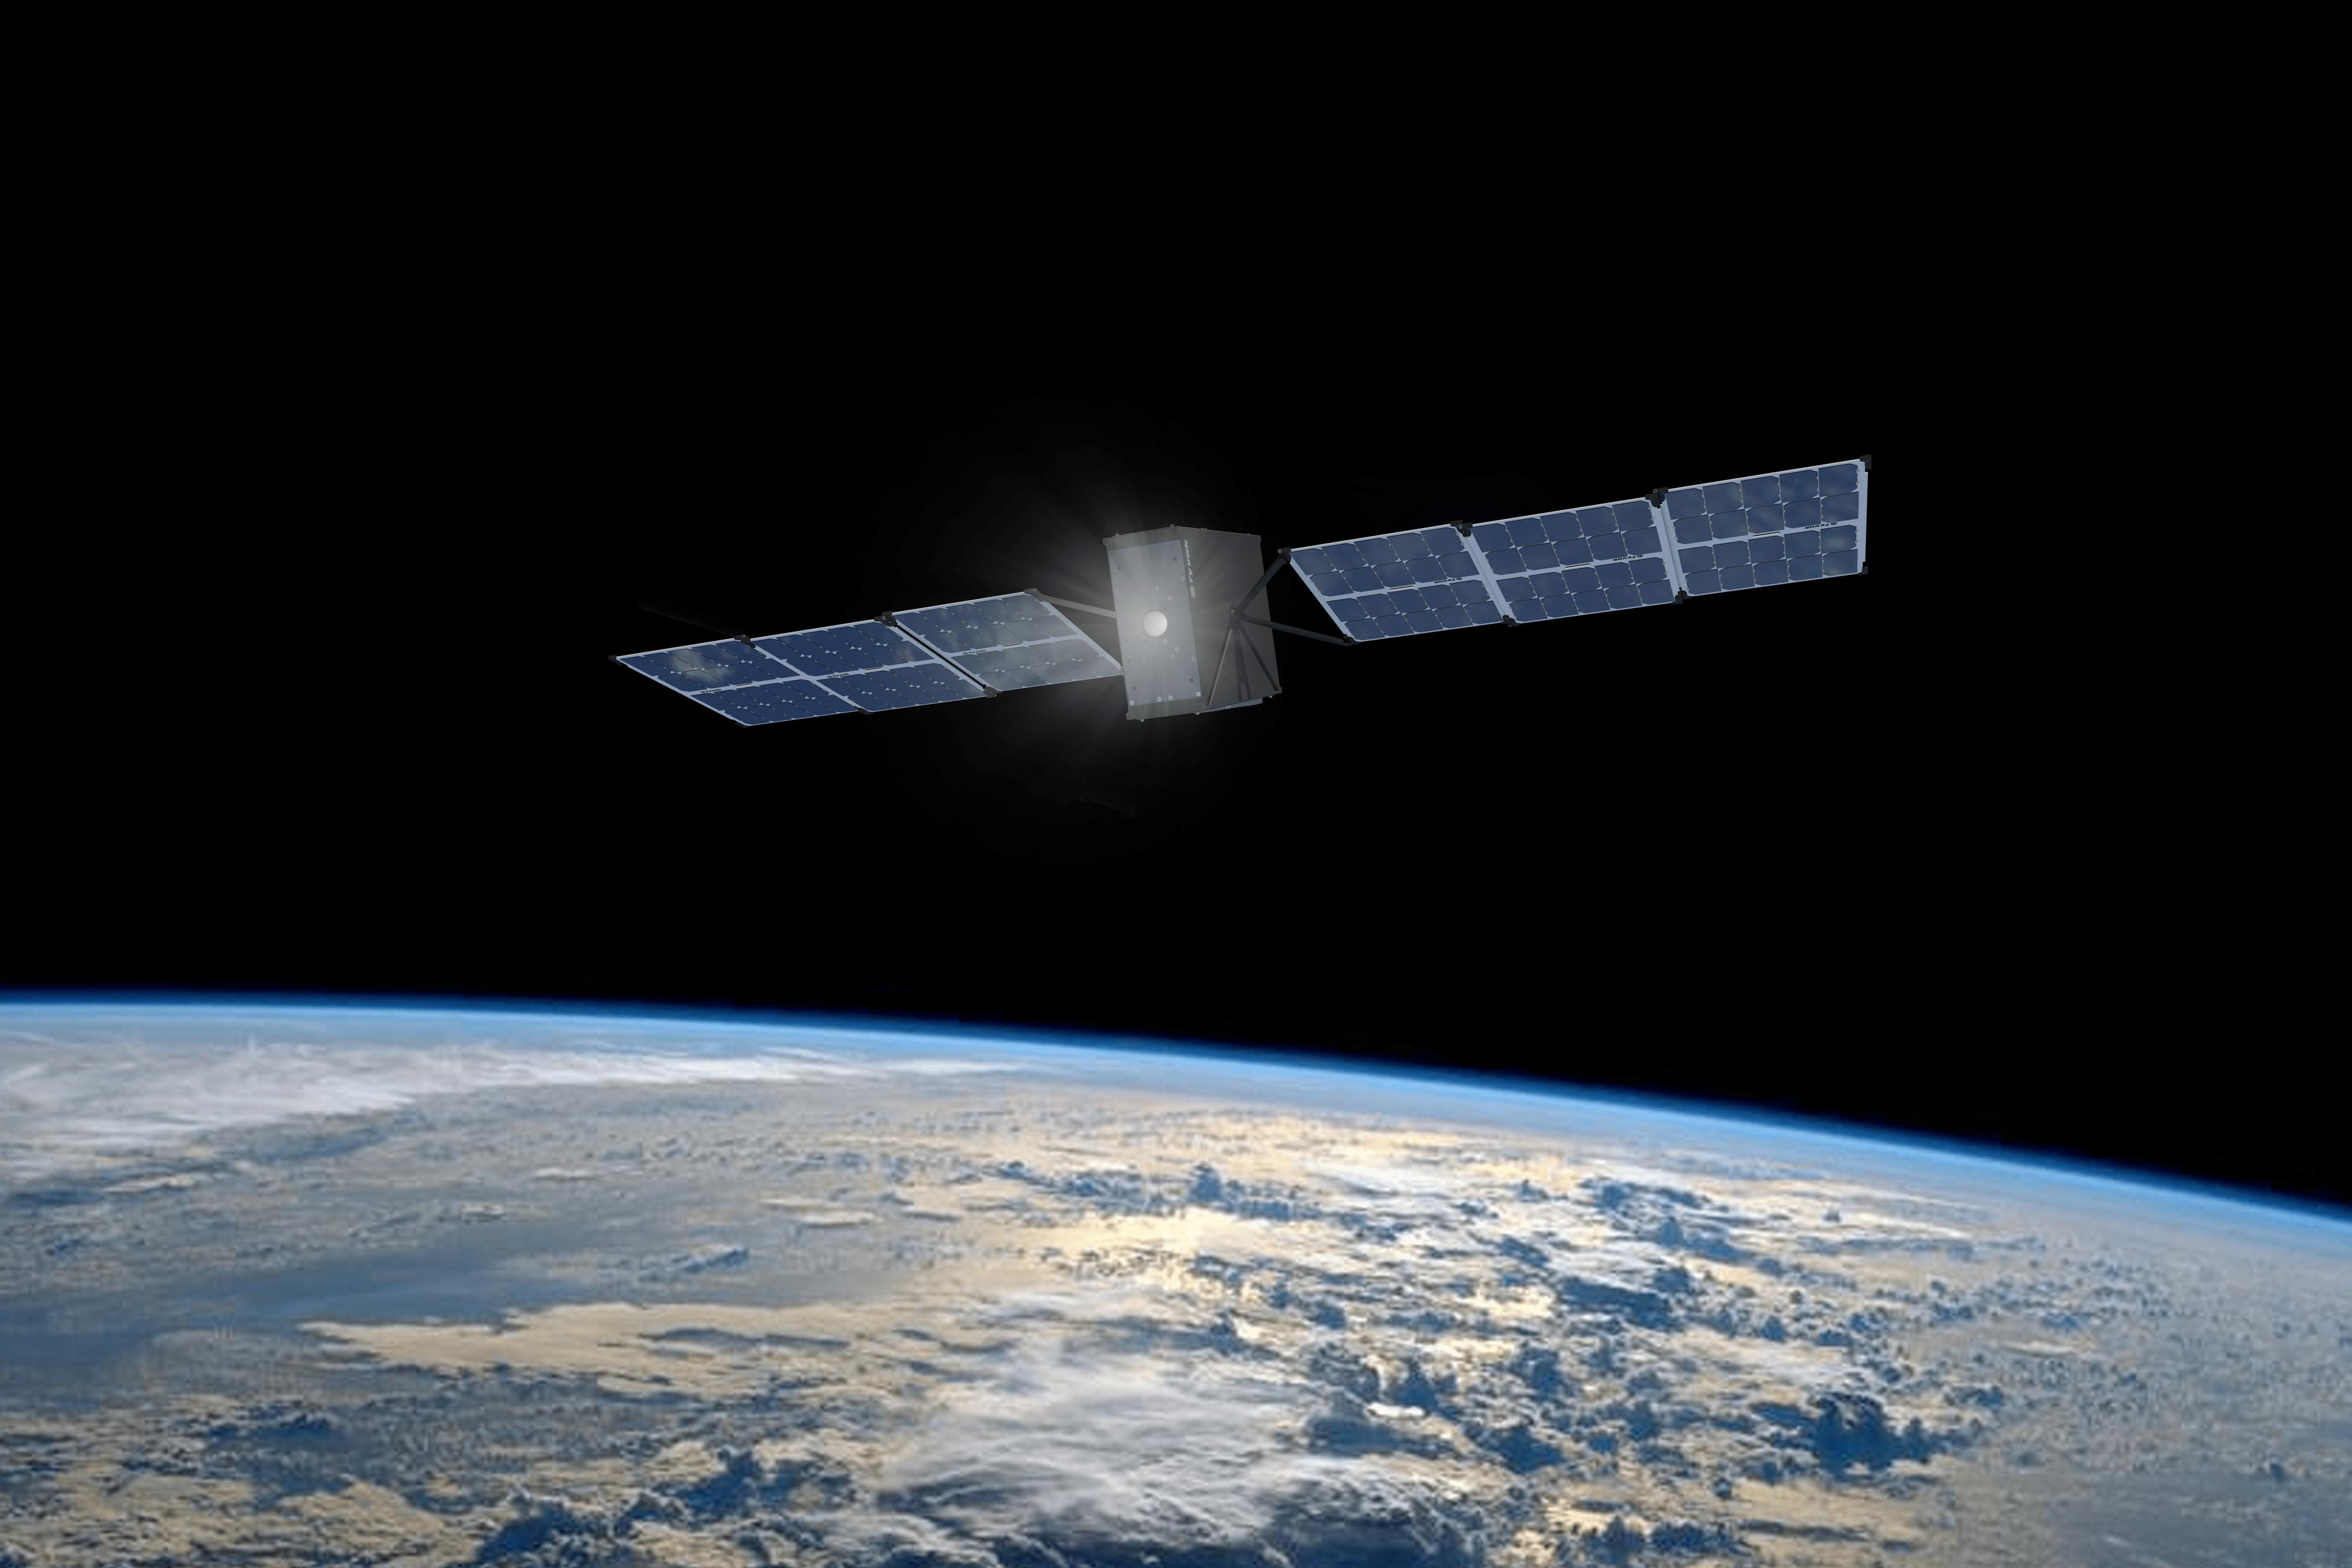 Un render del dimostratore tecnologico PDT-1 della NASA. Credits: NASA.